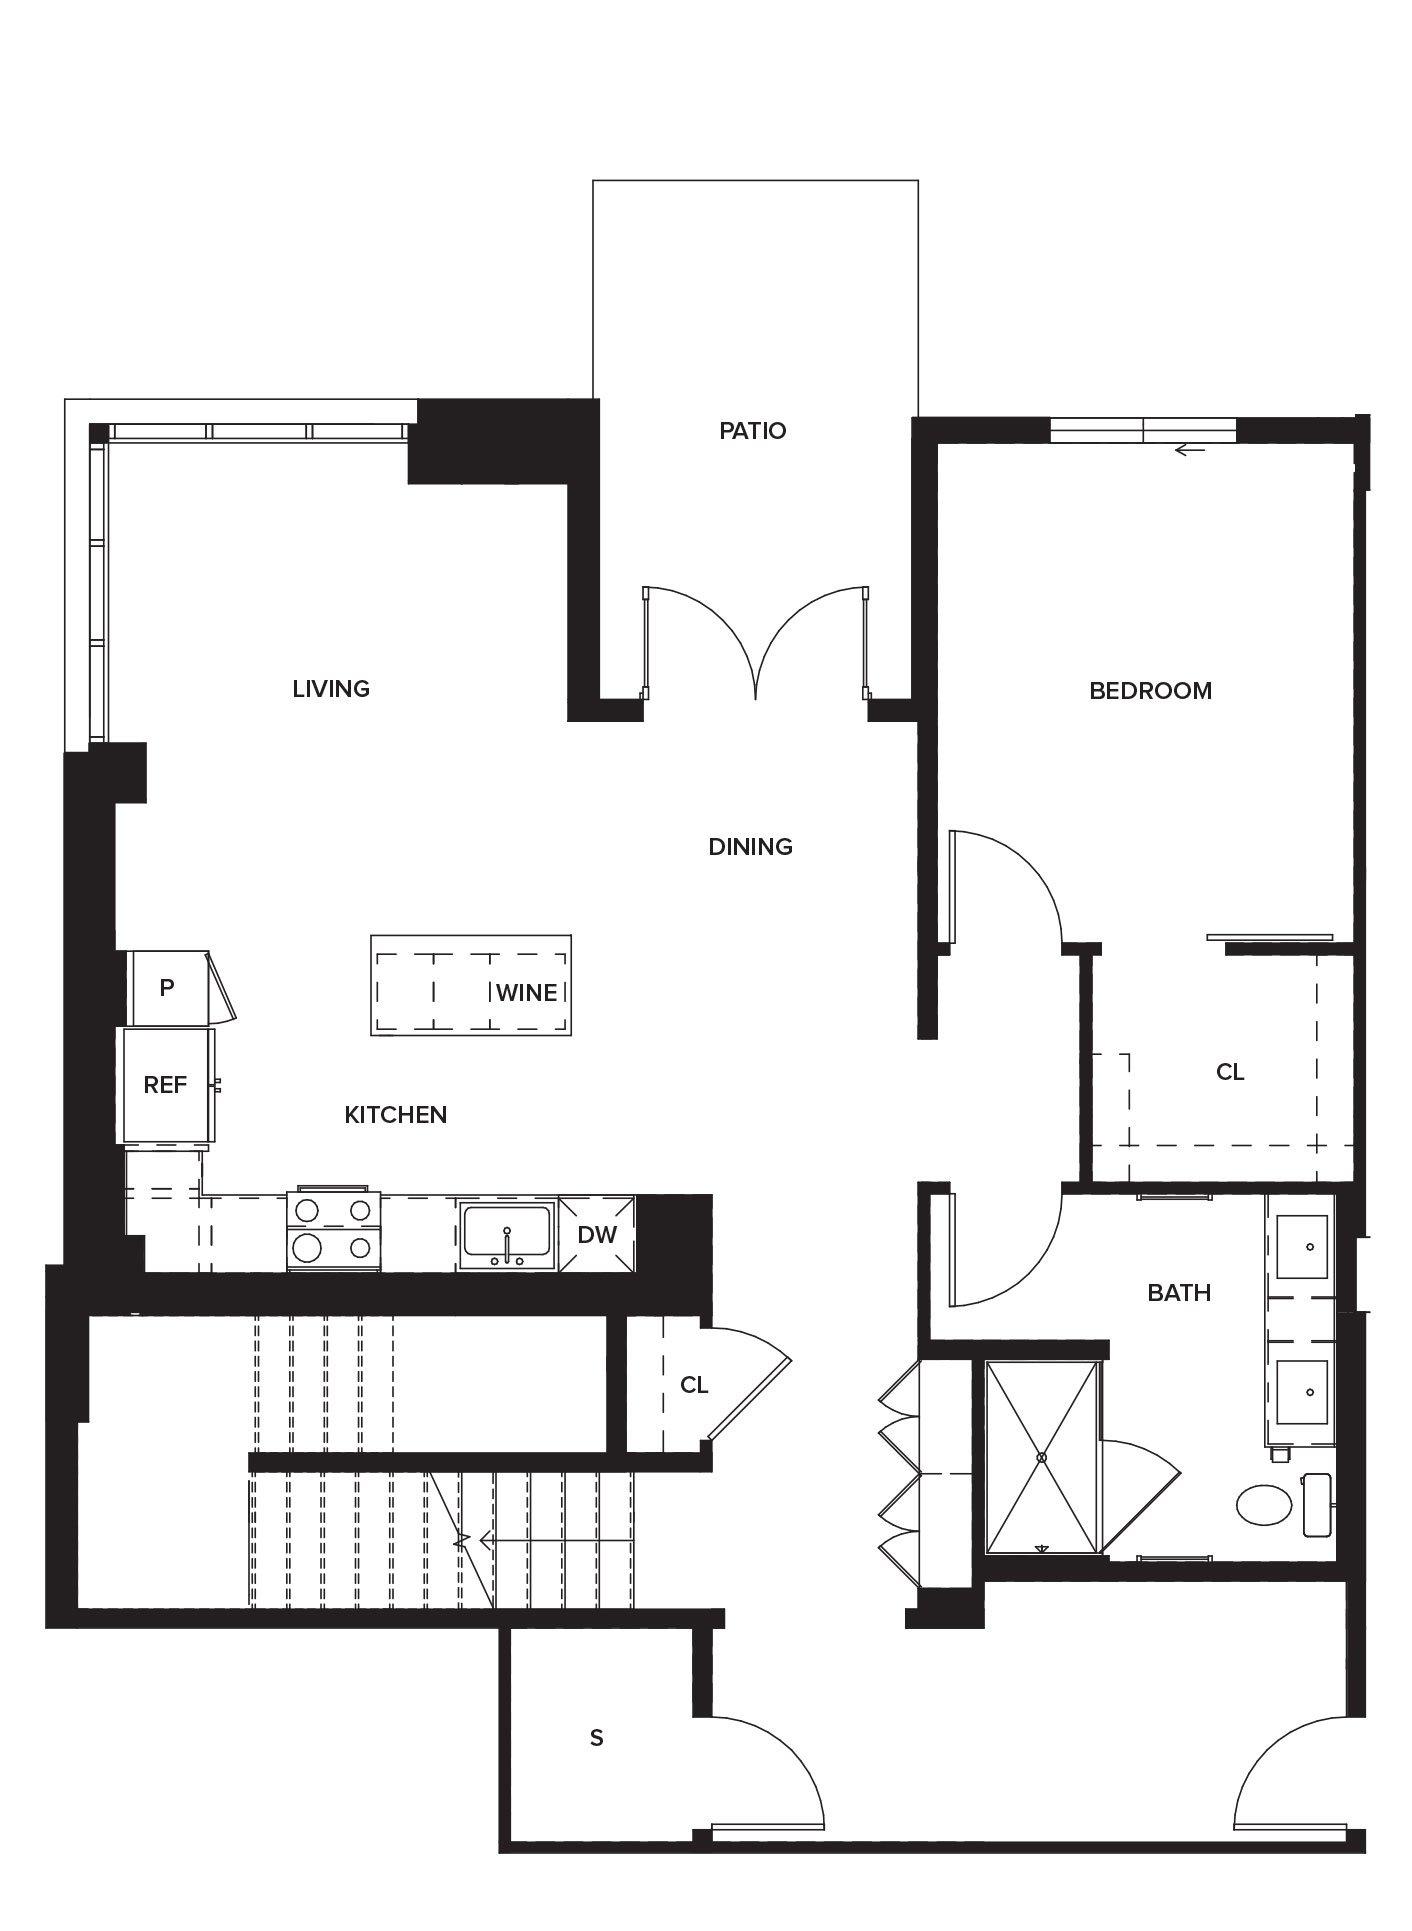 One Paseo Townhome 2 Floorplan